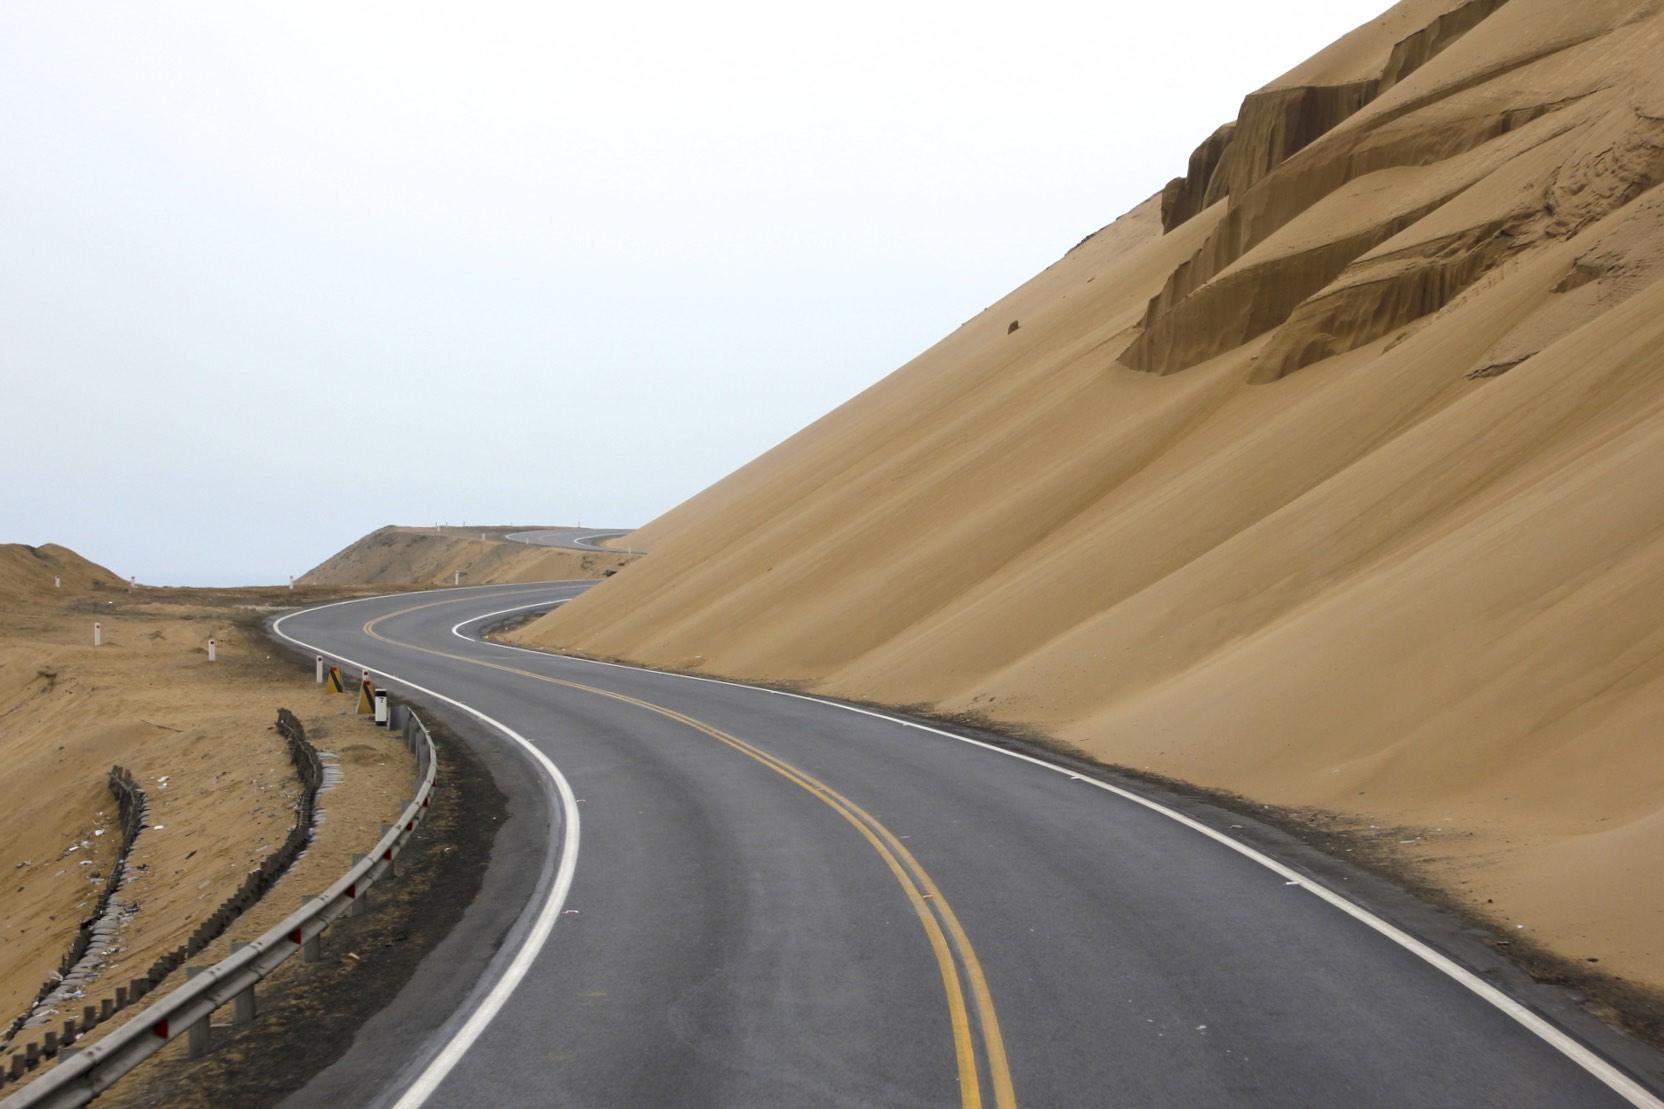 The TransAmerican Highway along the coastal desert of central Peru